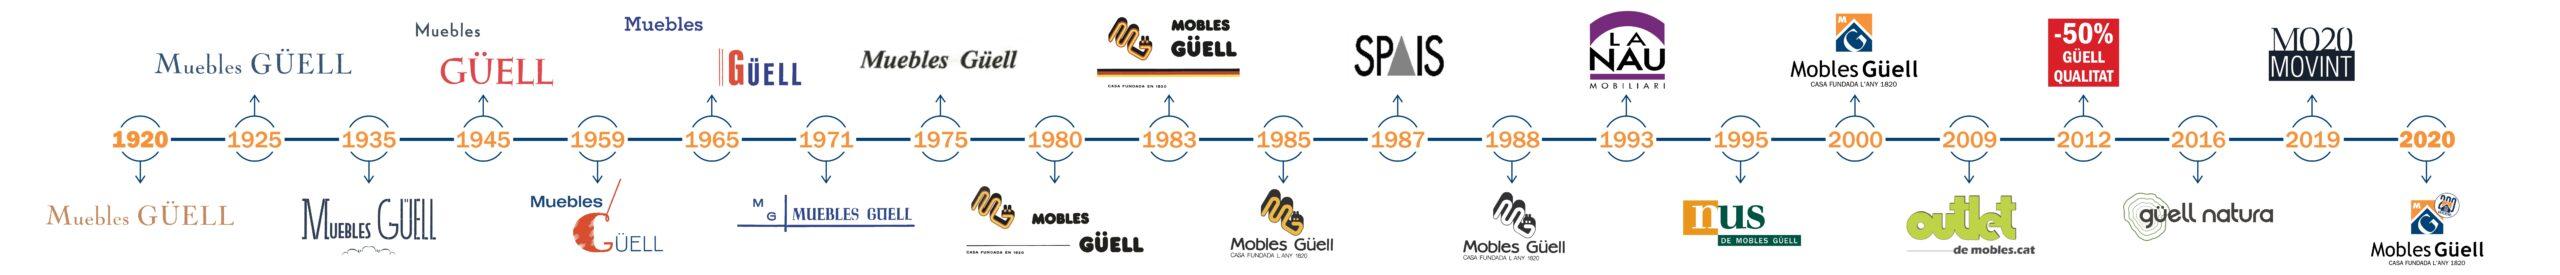 Cronograma Mobles Güell